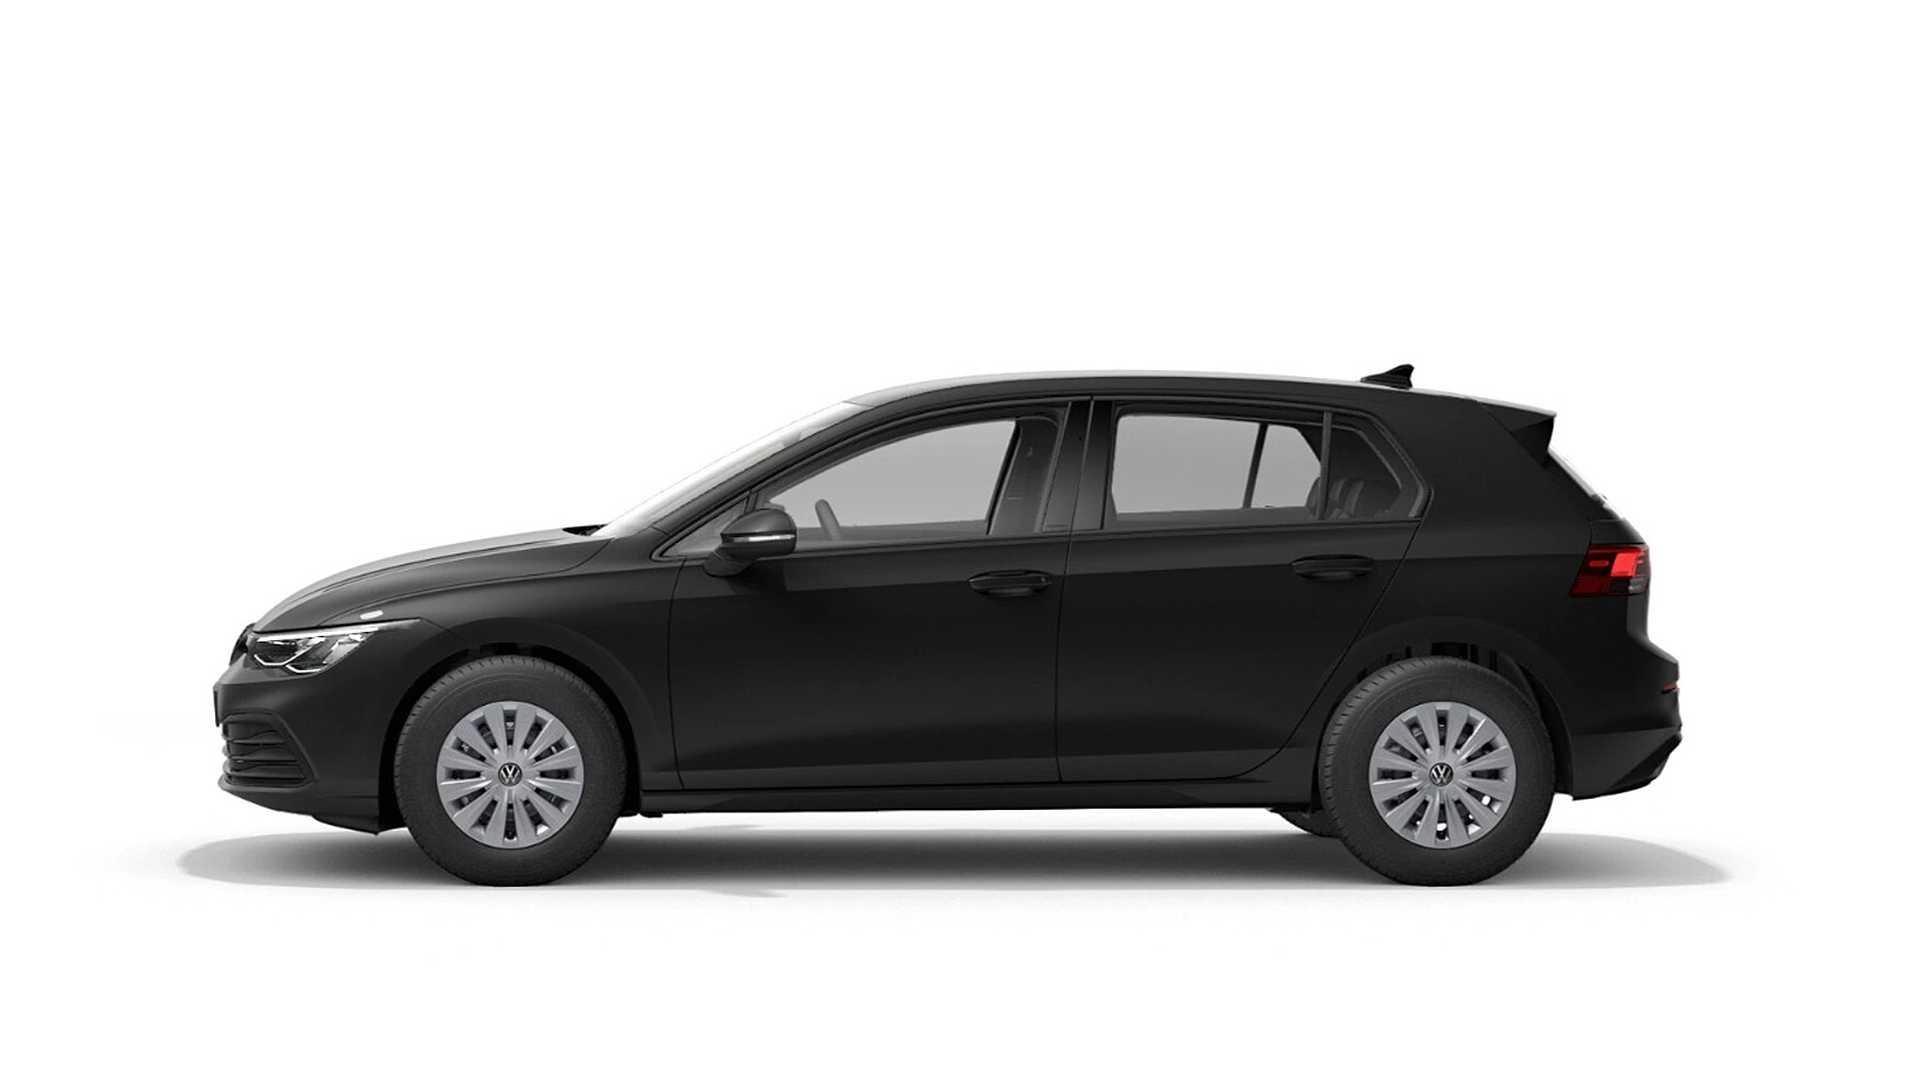 Volkswagen-Golf-2020-Base-Model-3